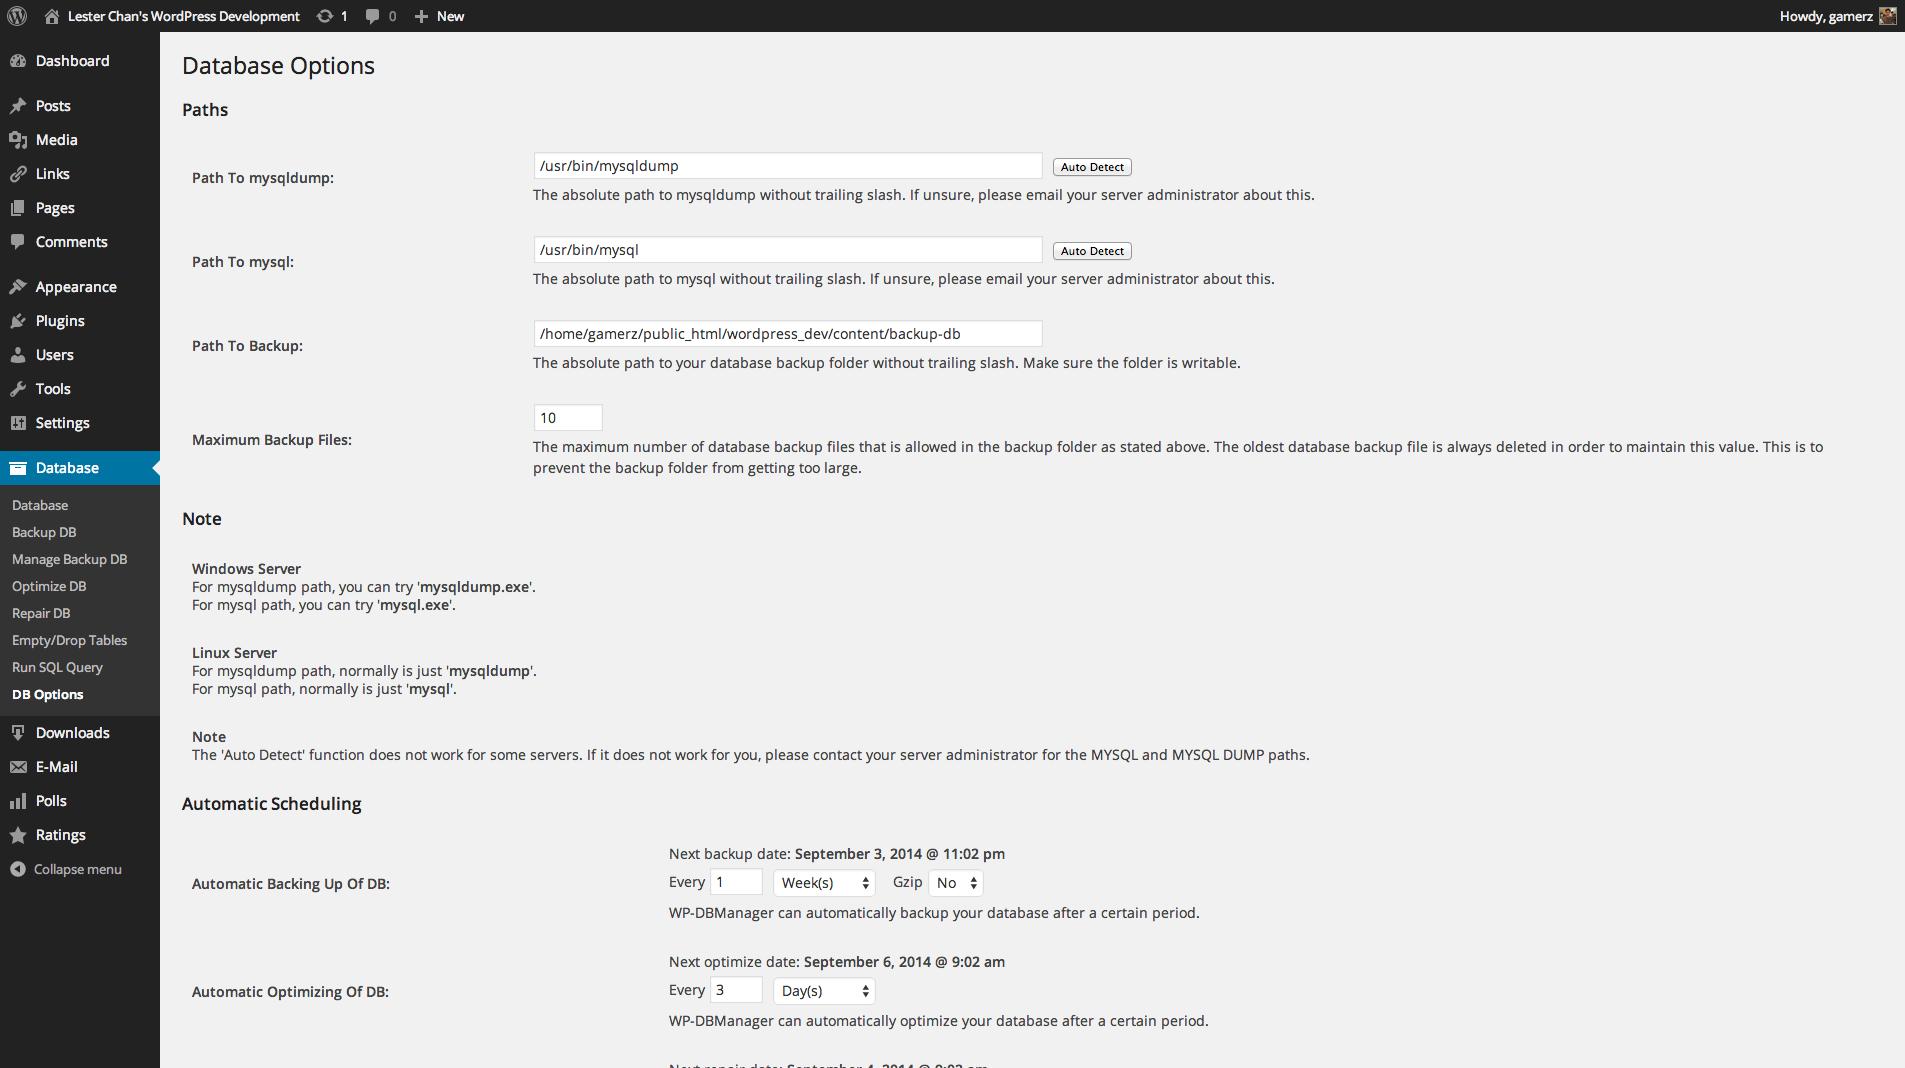 WP-DBManager's Screenshot: Admin - DB Options